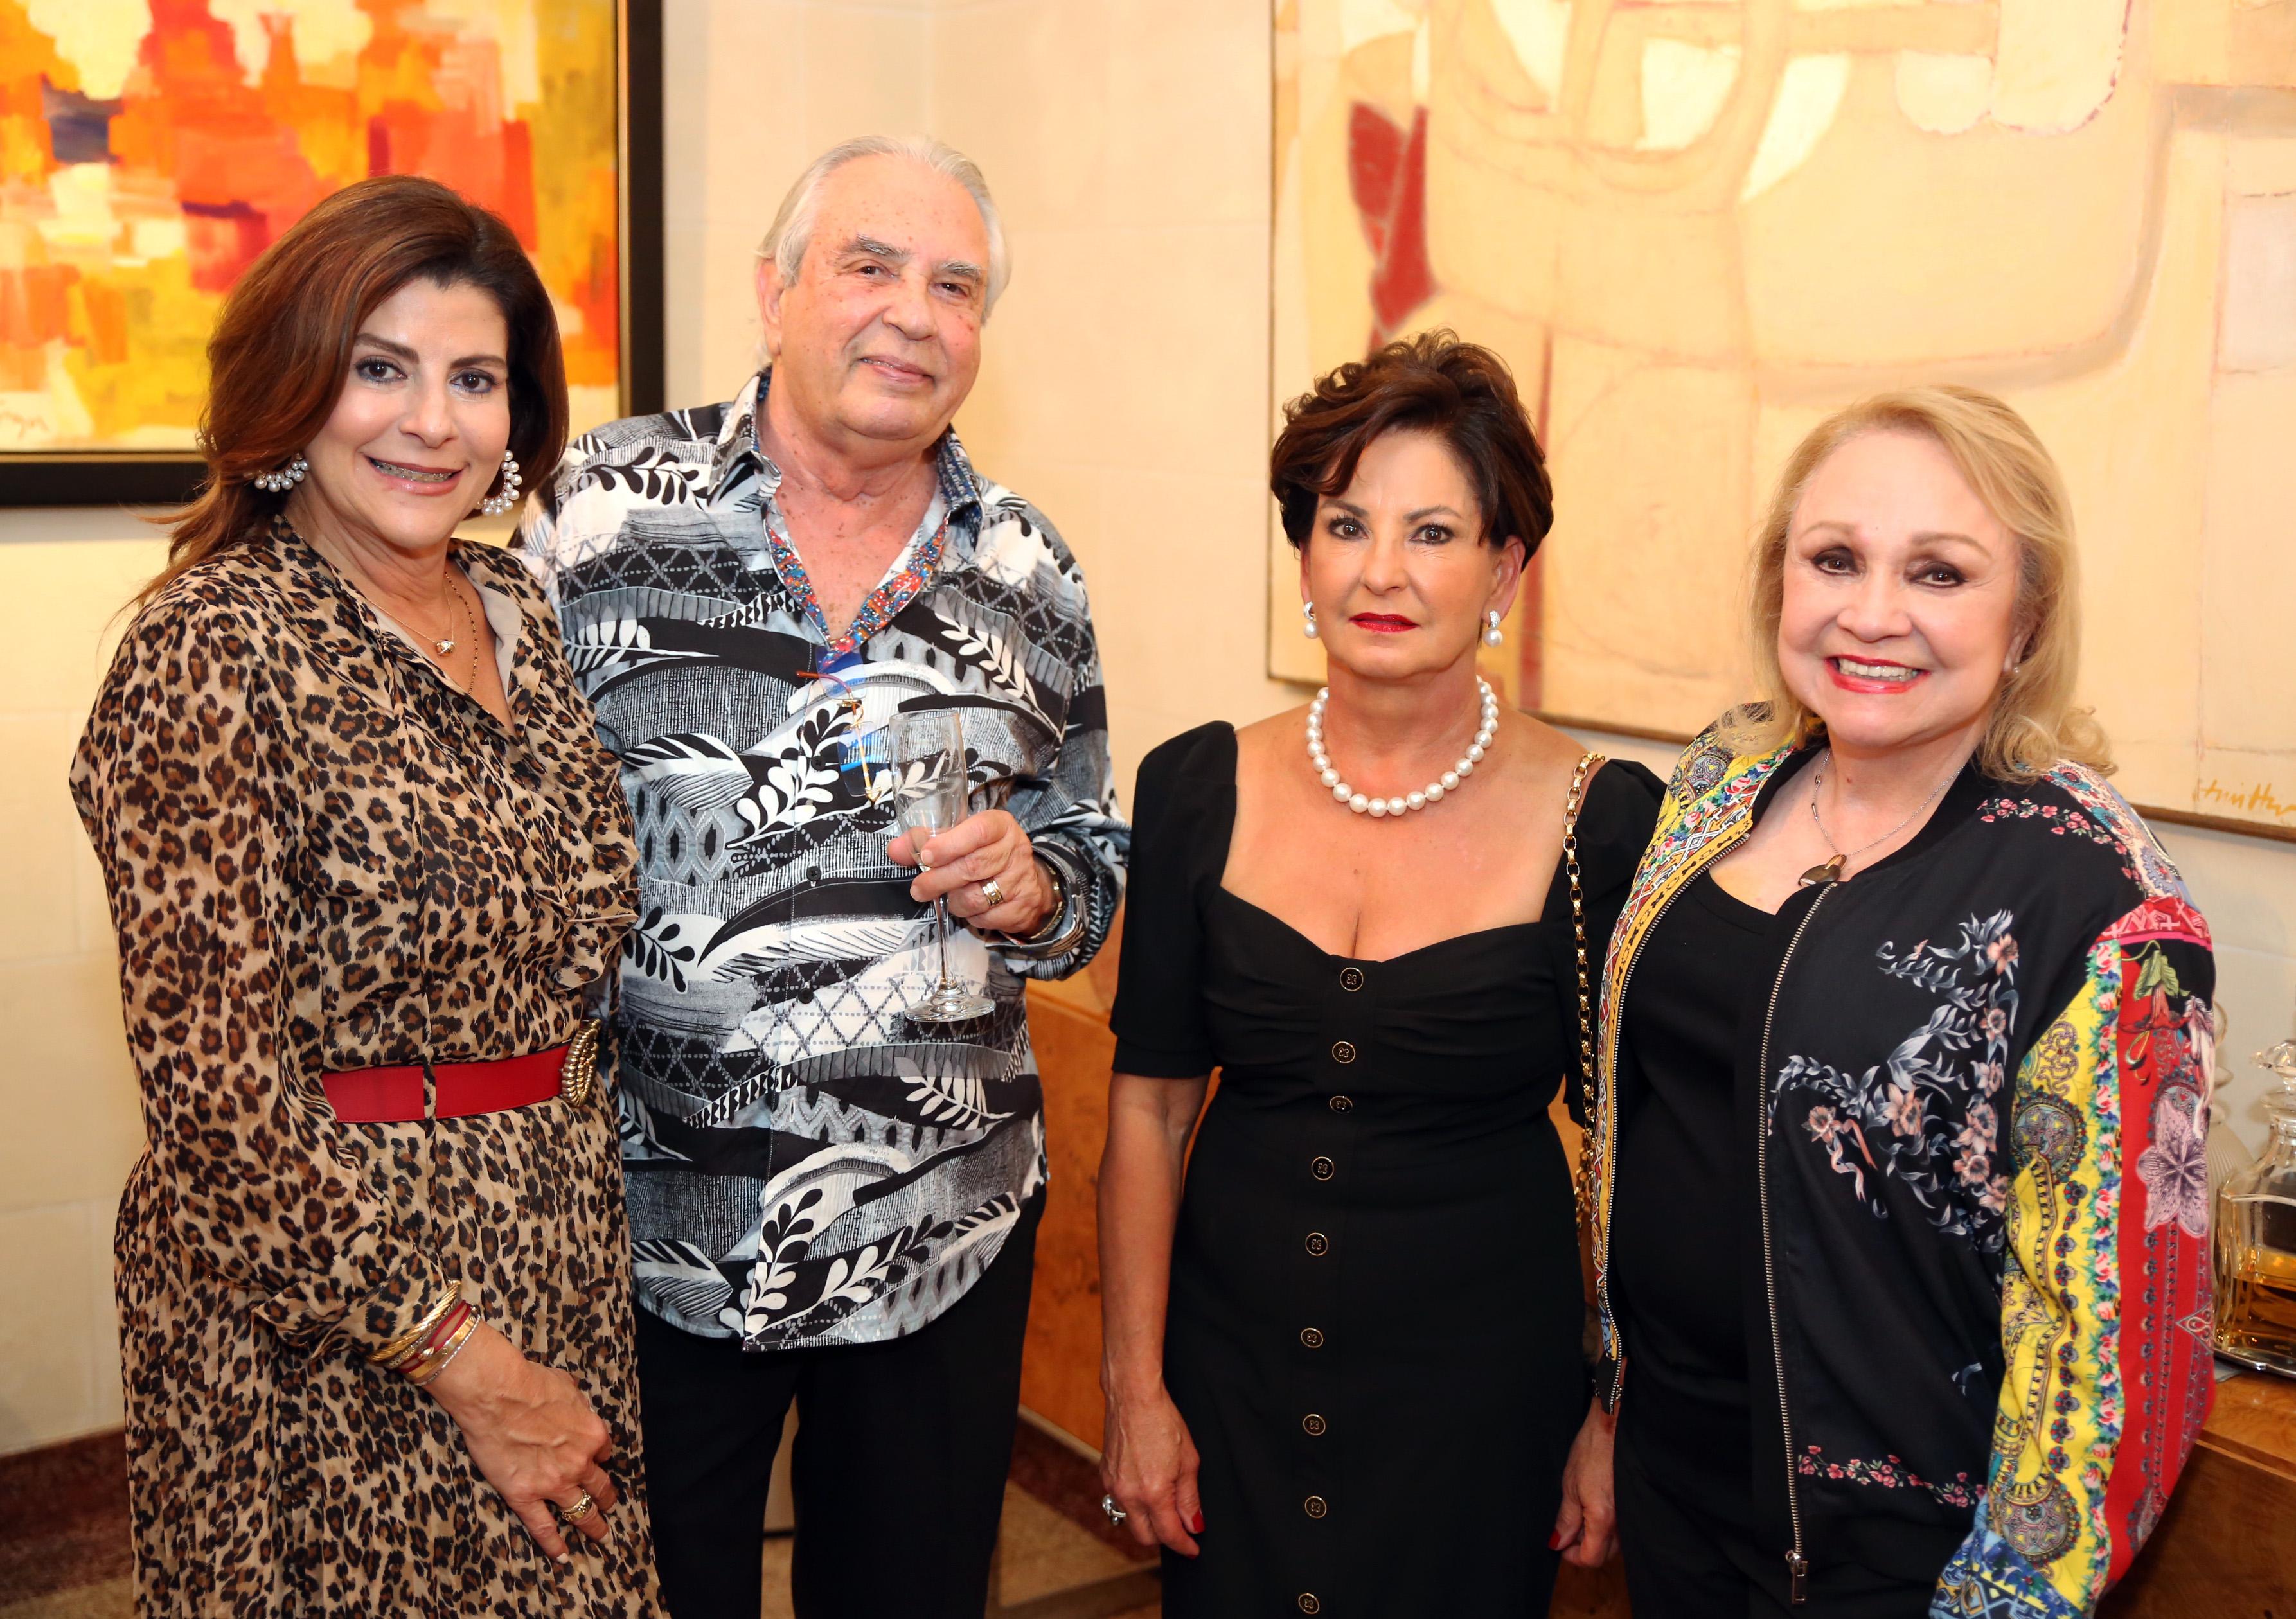 Ileanexis Colón, Kiko Márquez, Anabel Rivera y Milly McCormick. (José. R. Pérez Centeno)